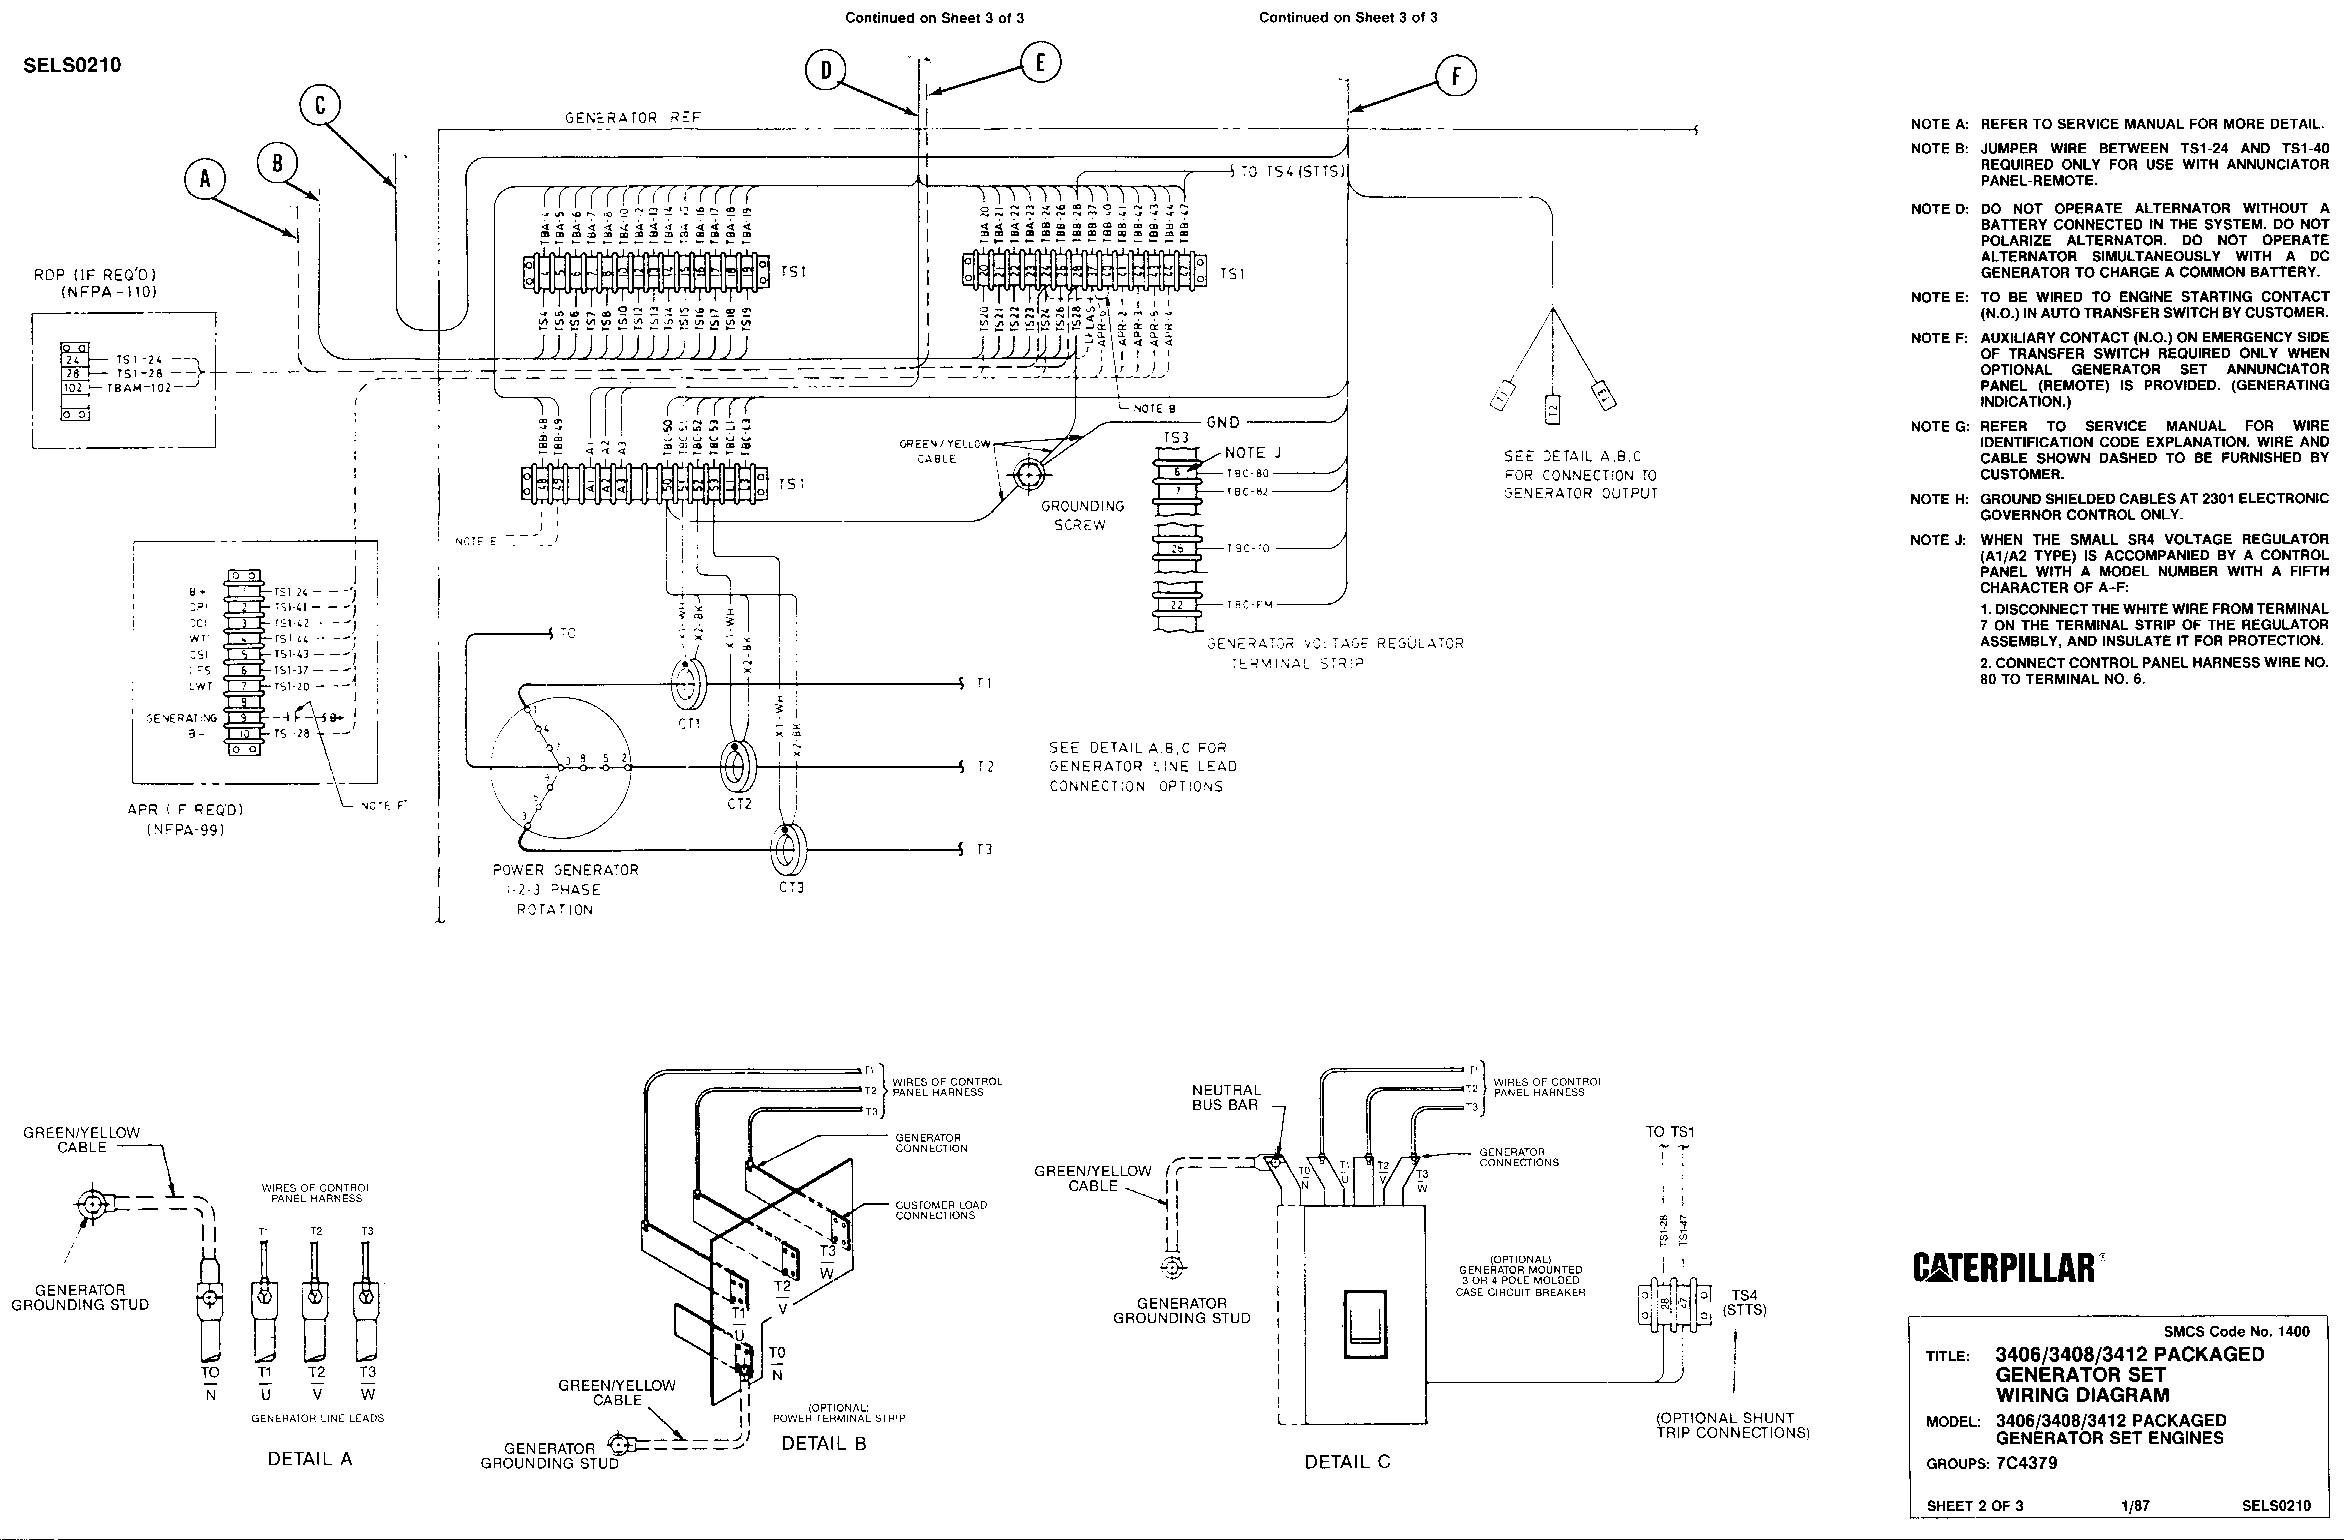 Caterpillar C15 Ecm Wiring Diagram Manual Guide